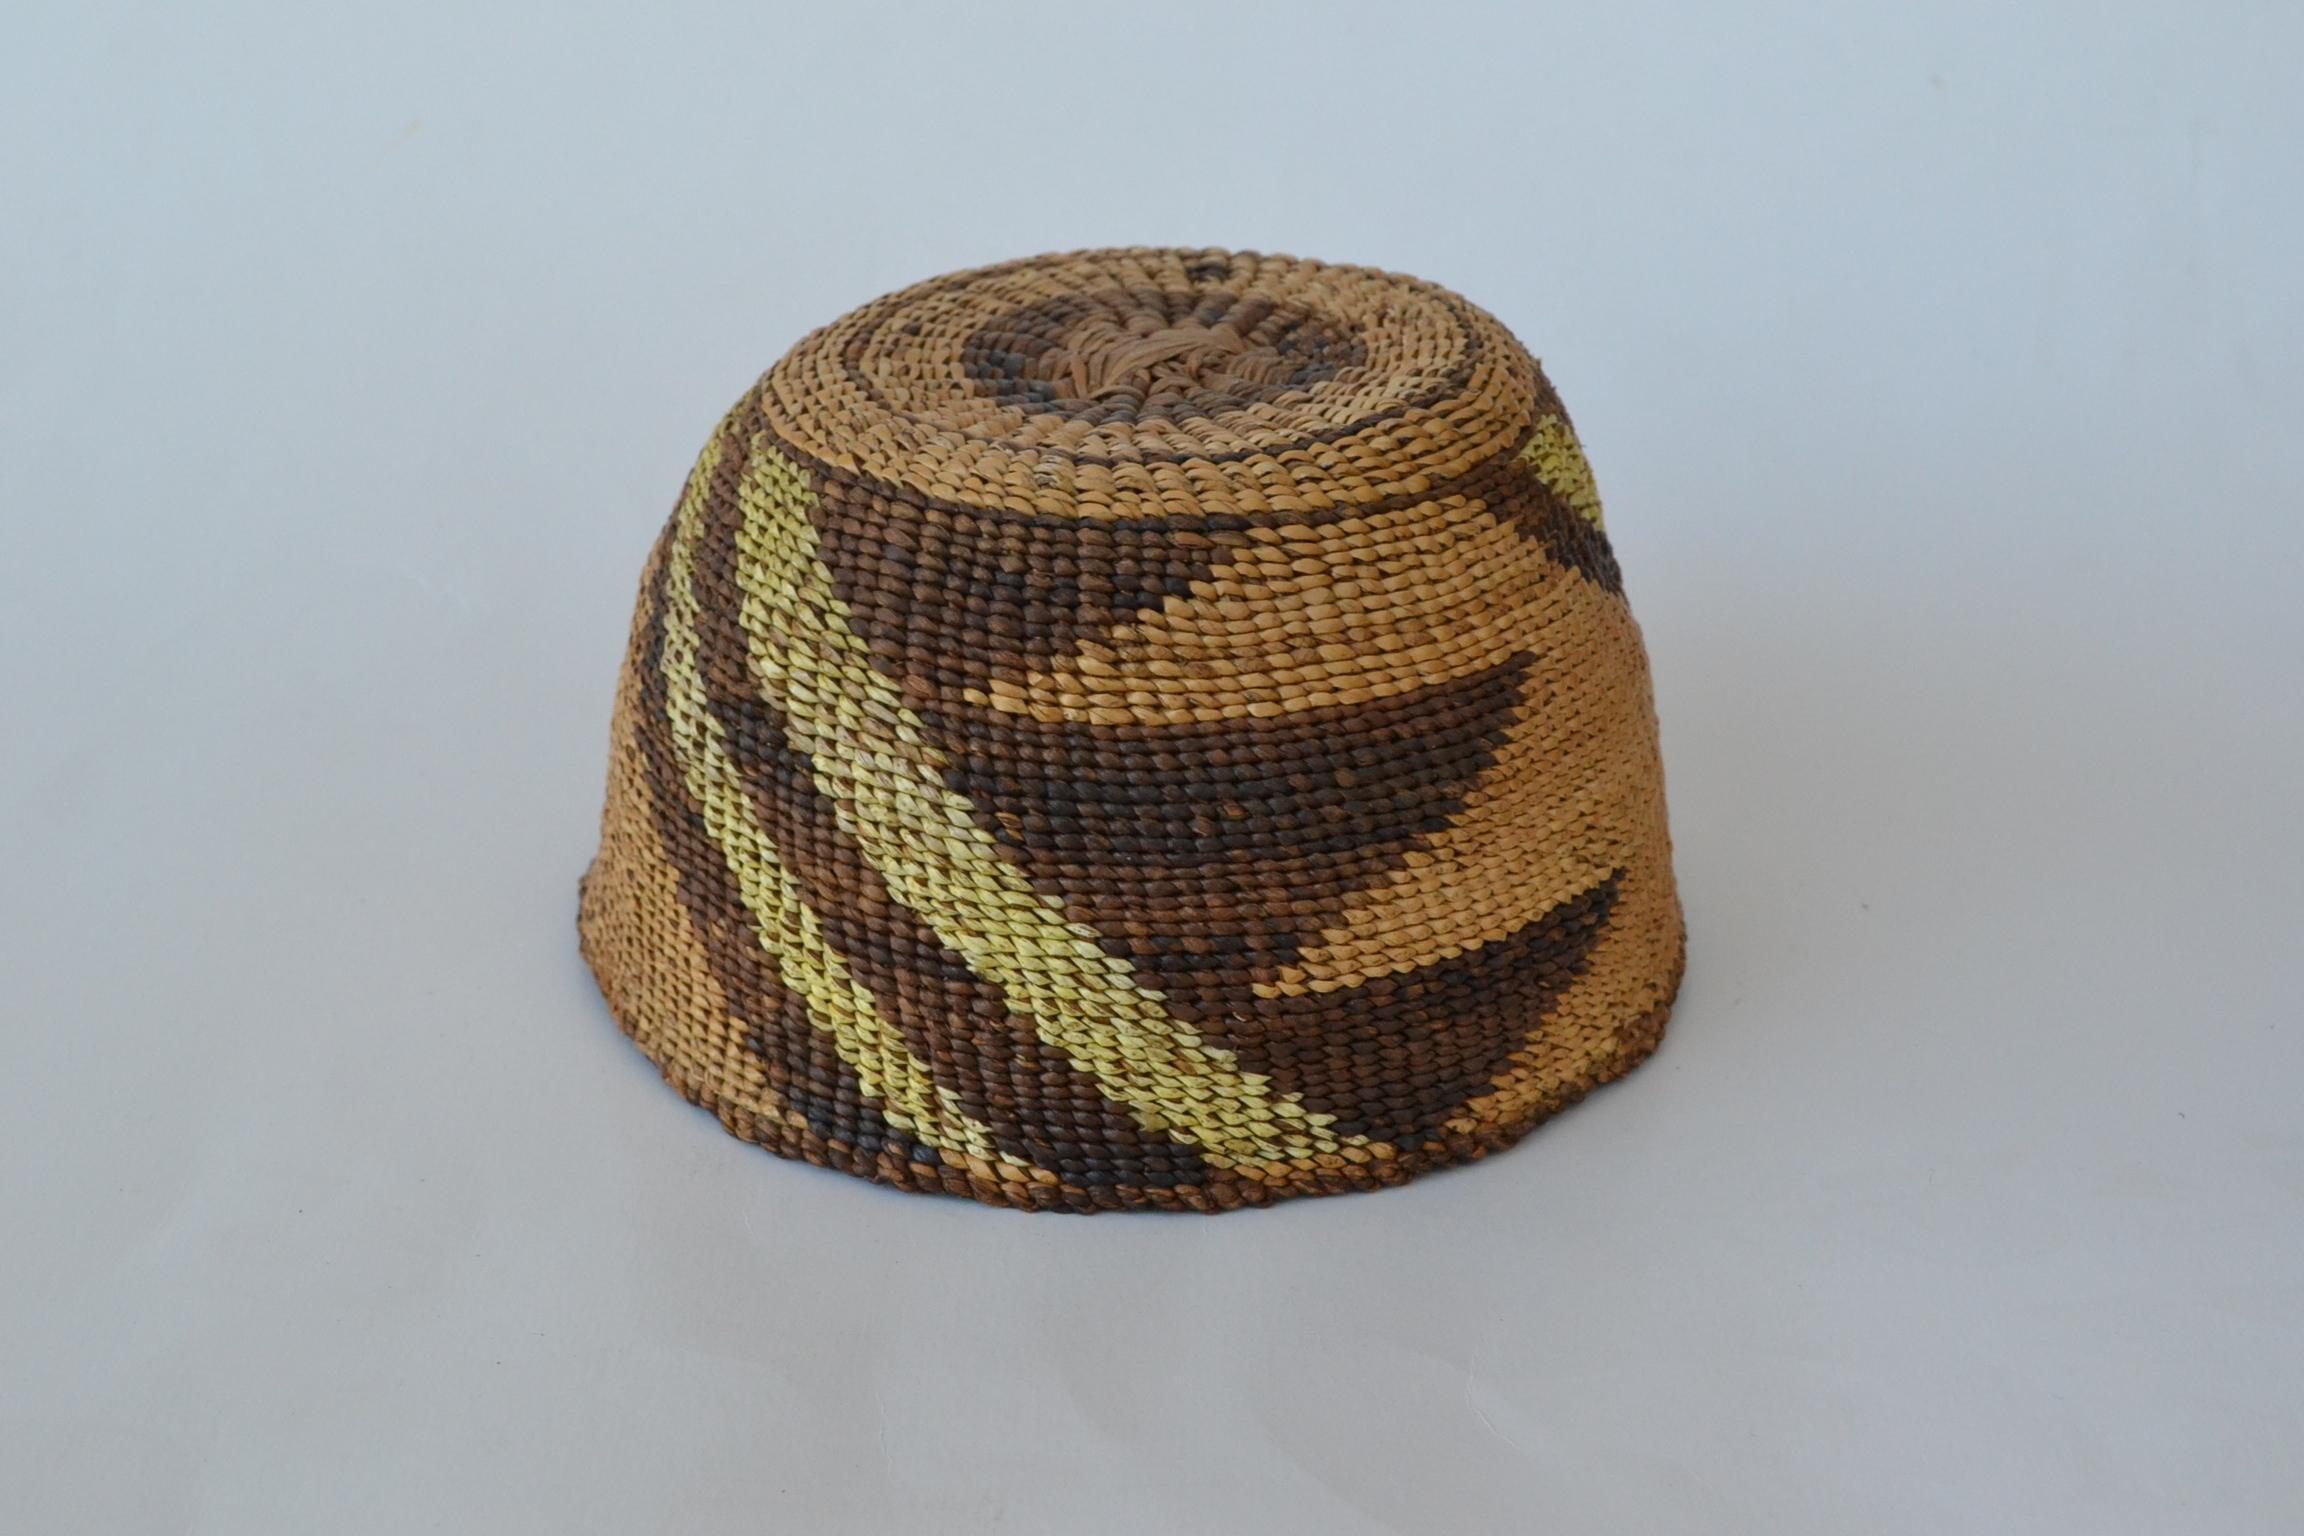 vintage native american indian hats klamath modoc child's woven hat